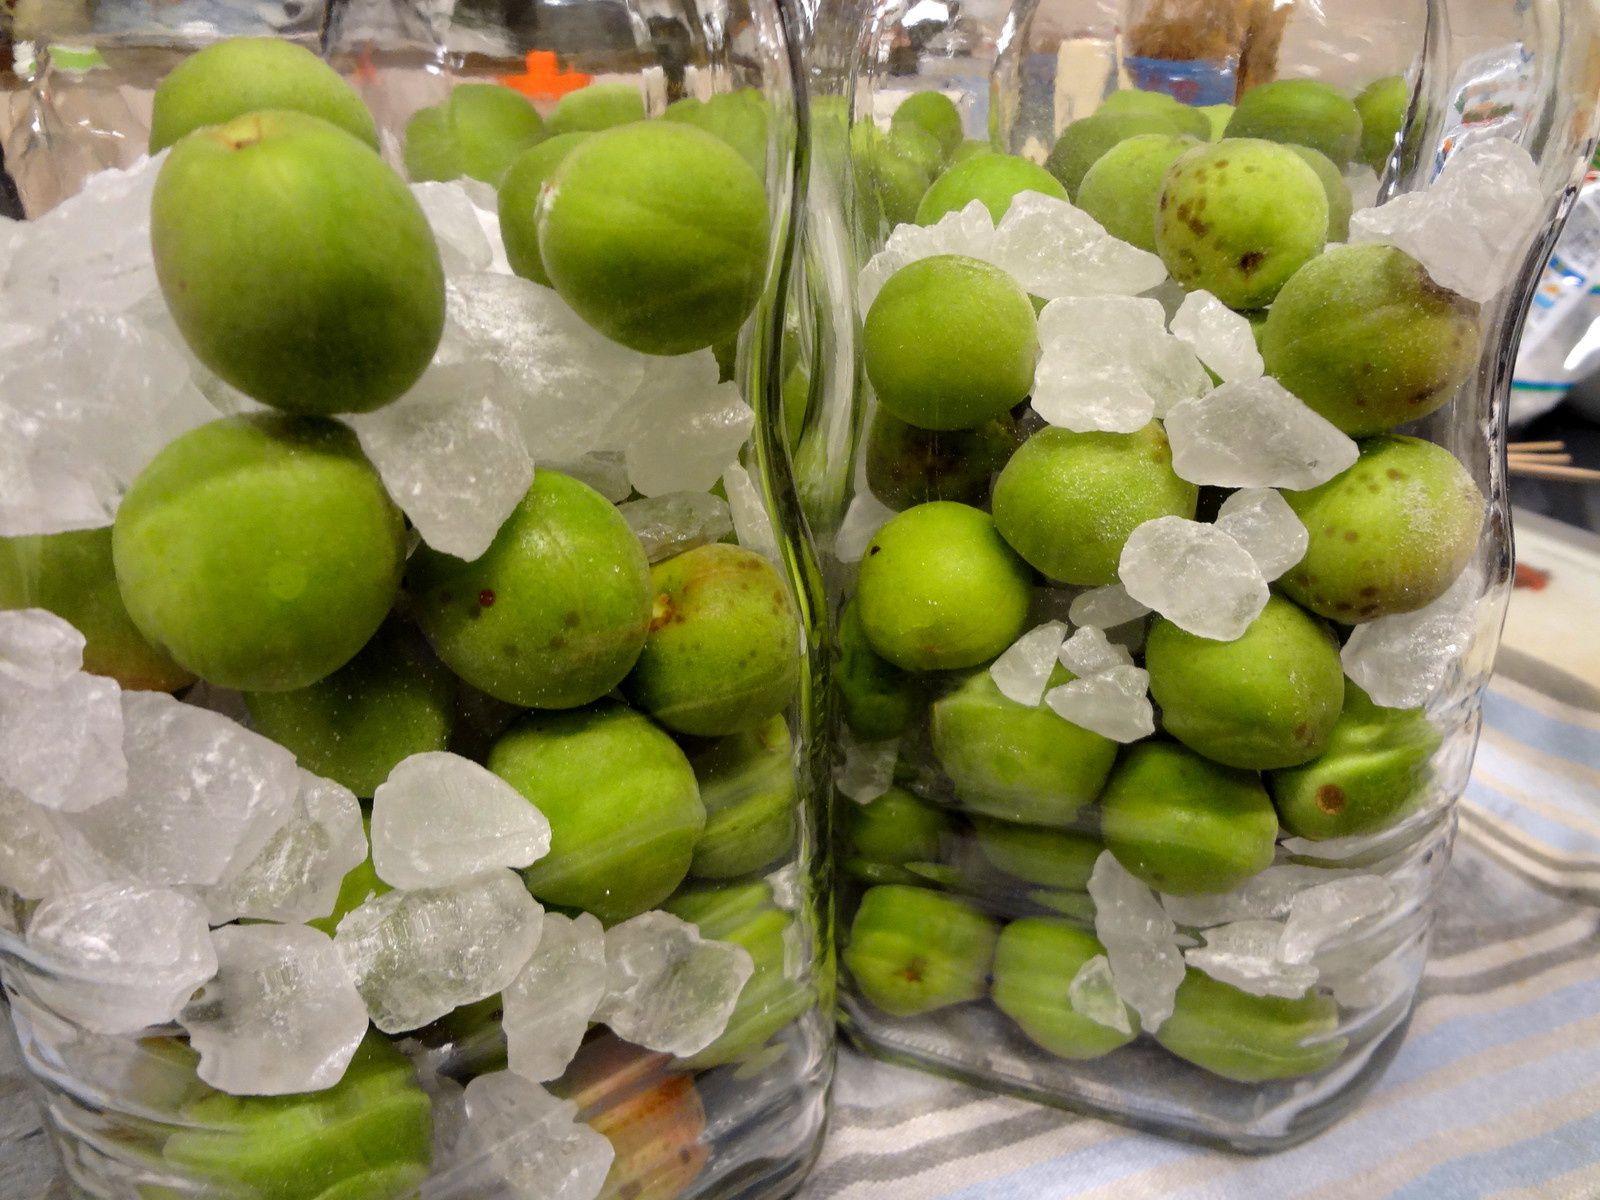 Les prunes vertes 'ume' en 2015